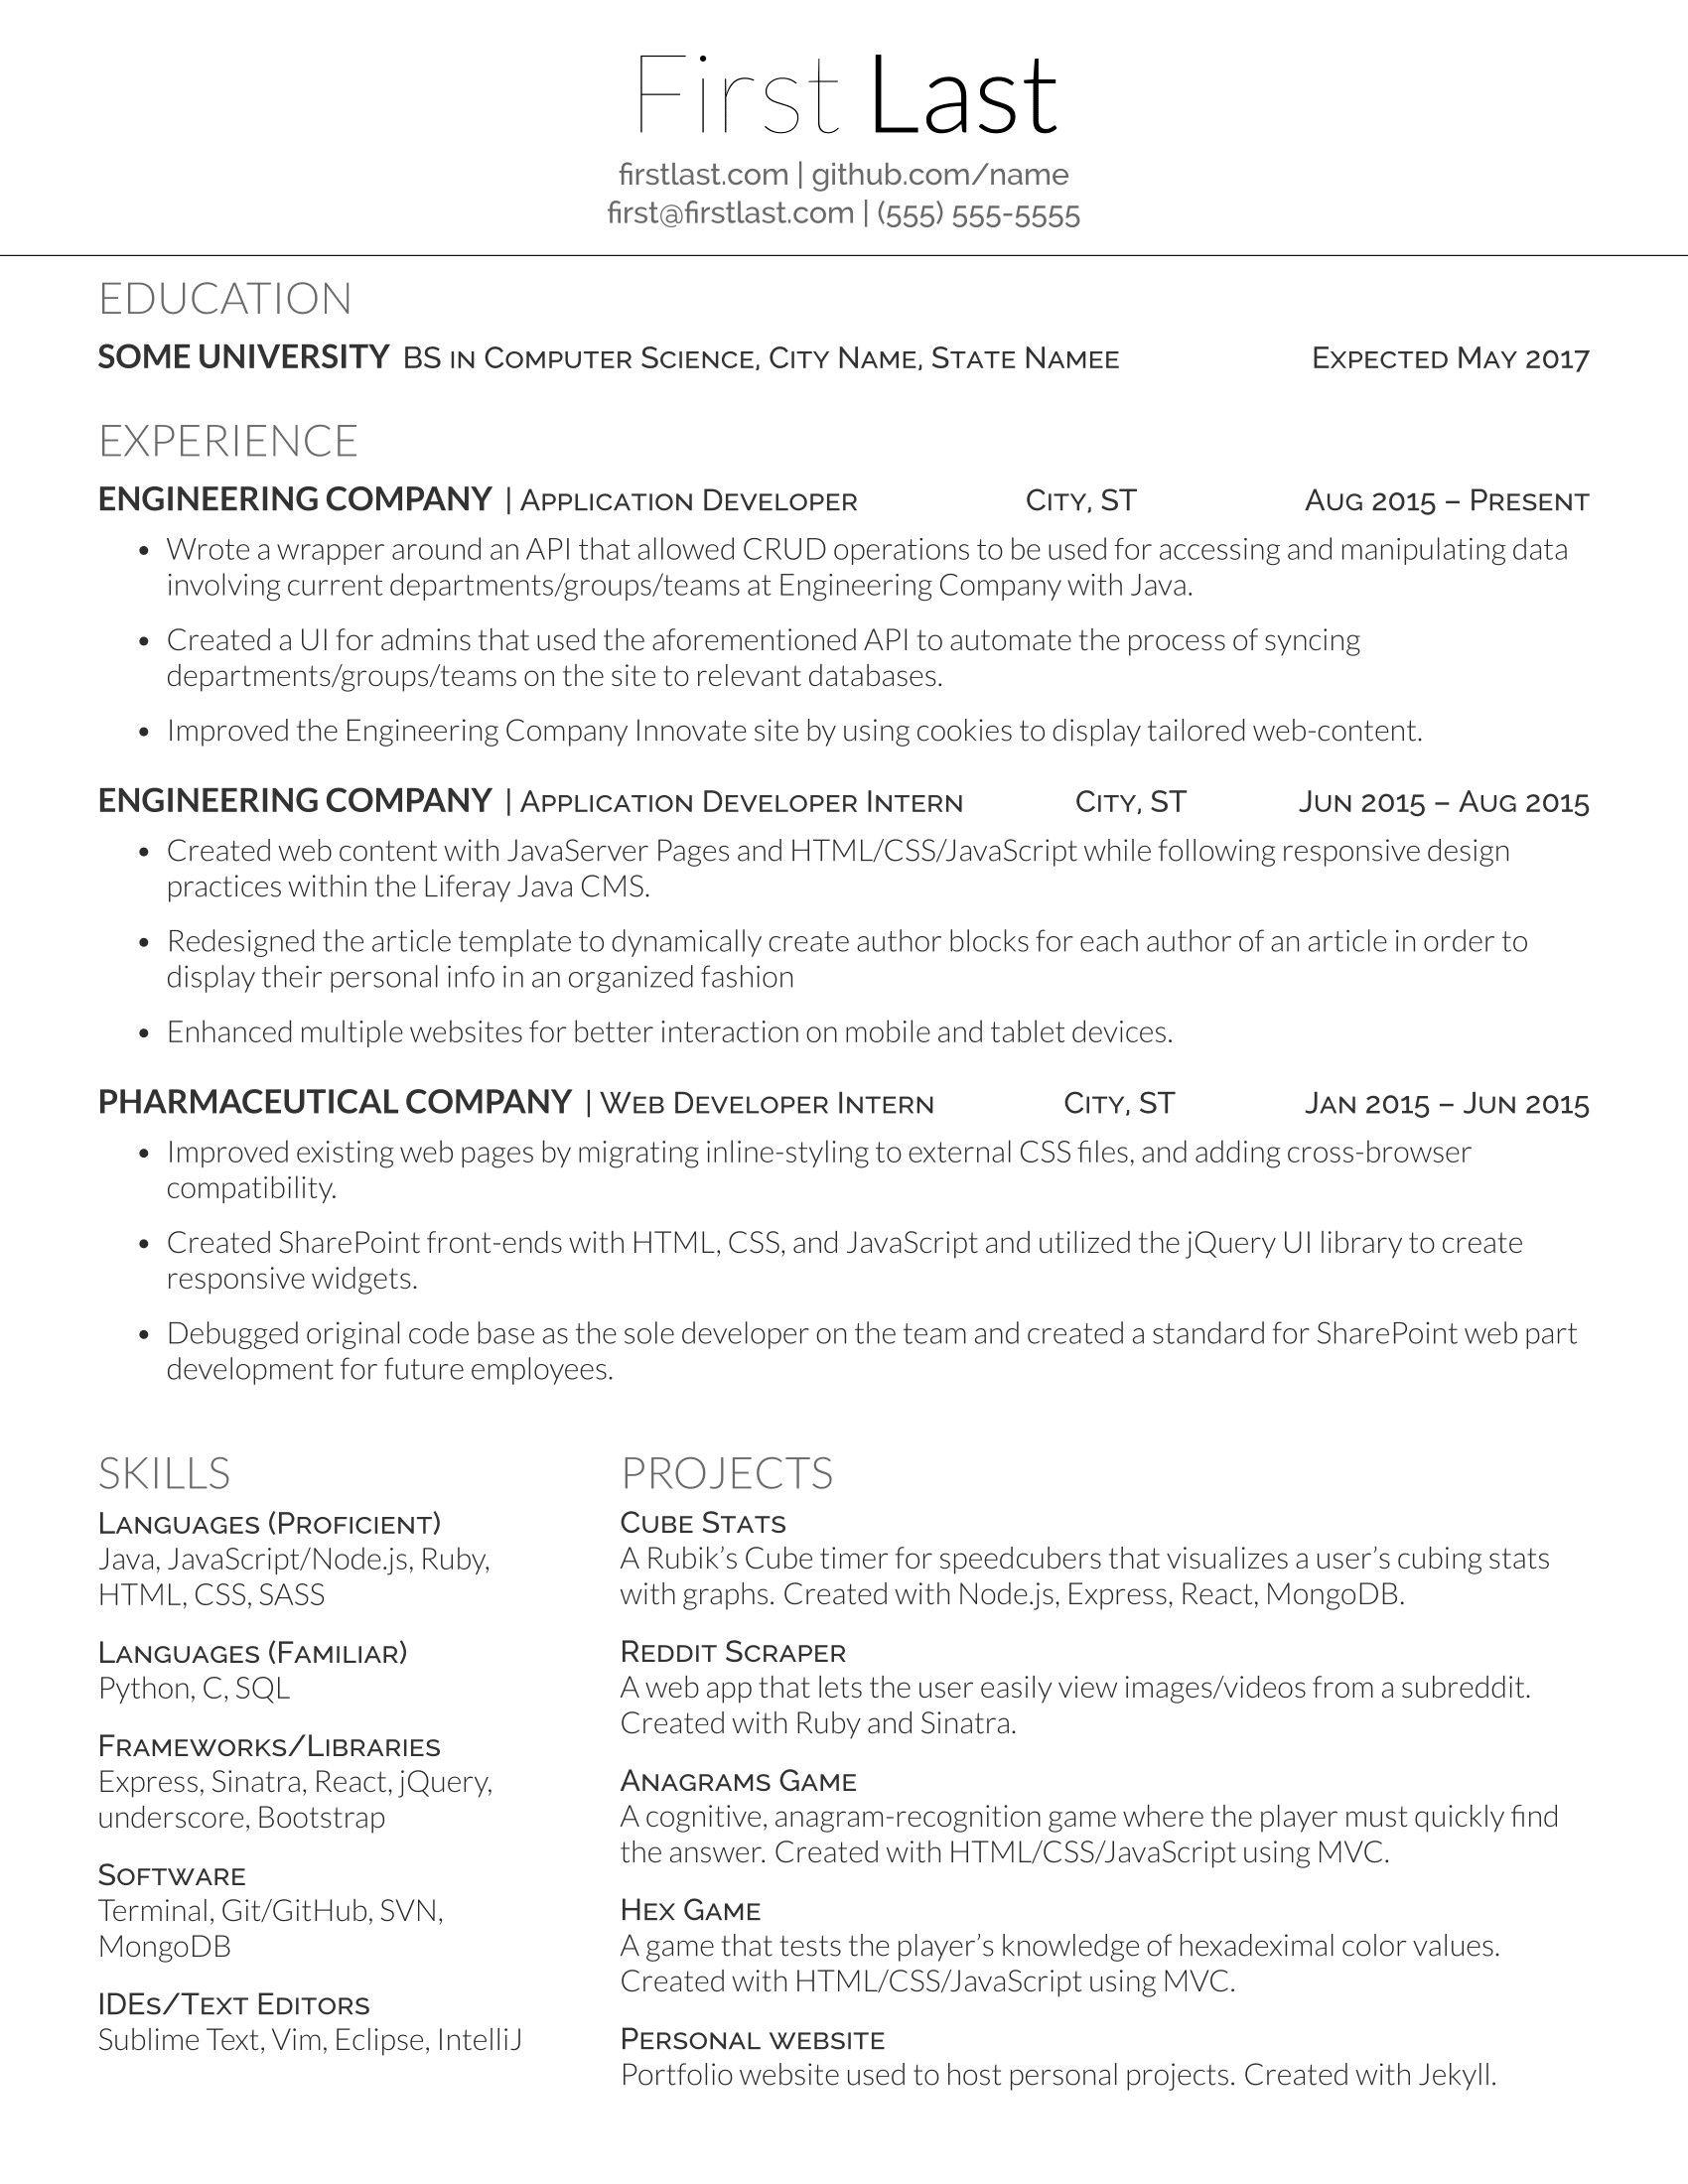 Resume Format Reddit Resume template examples, Resume